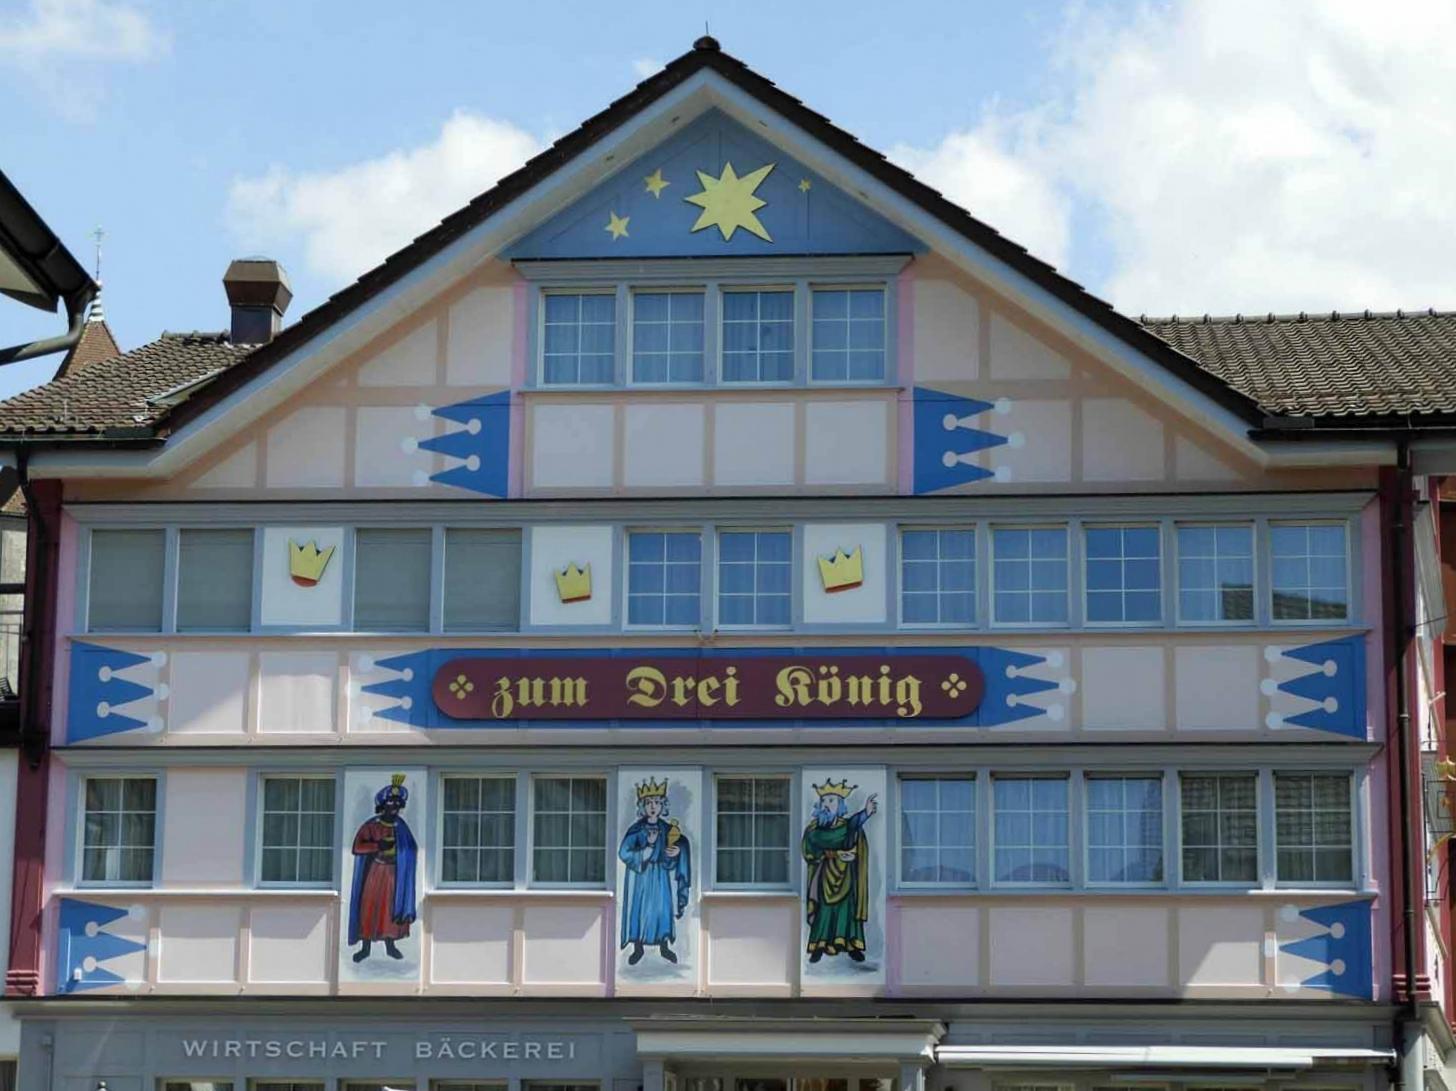 switzerland-appenzell-local-building-art.JPG